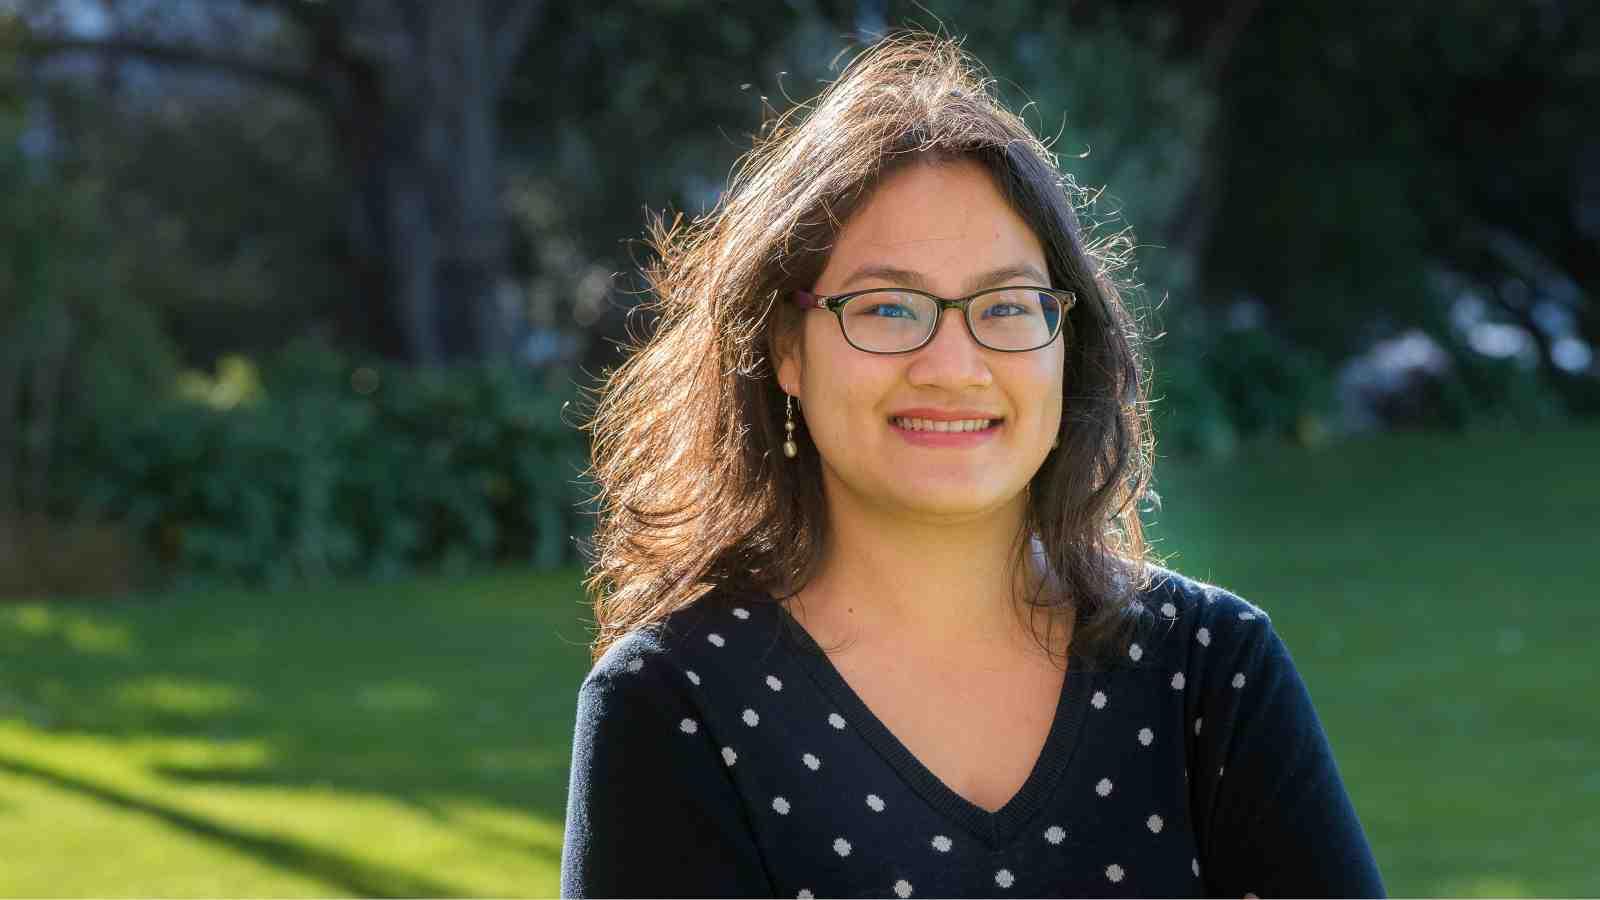 PhD candidate Reneeta Mogan Naidu